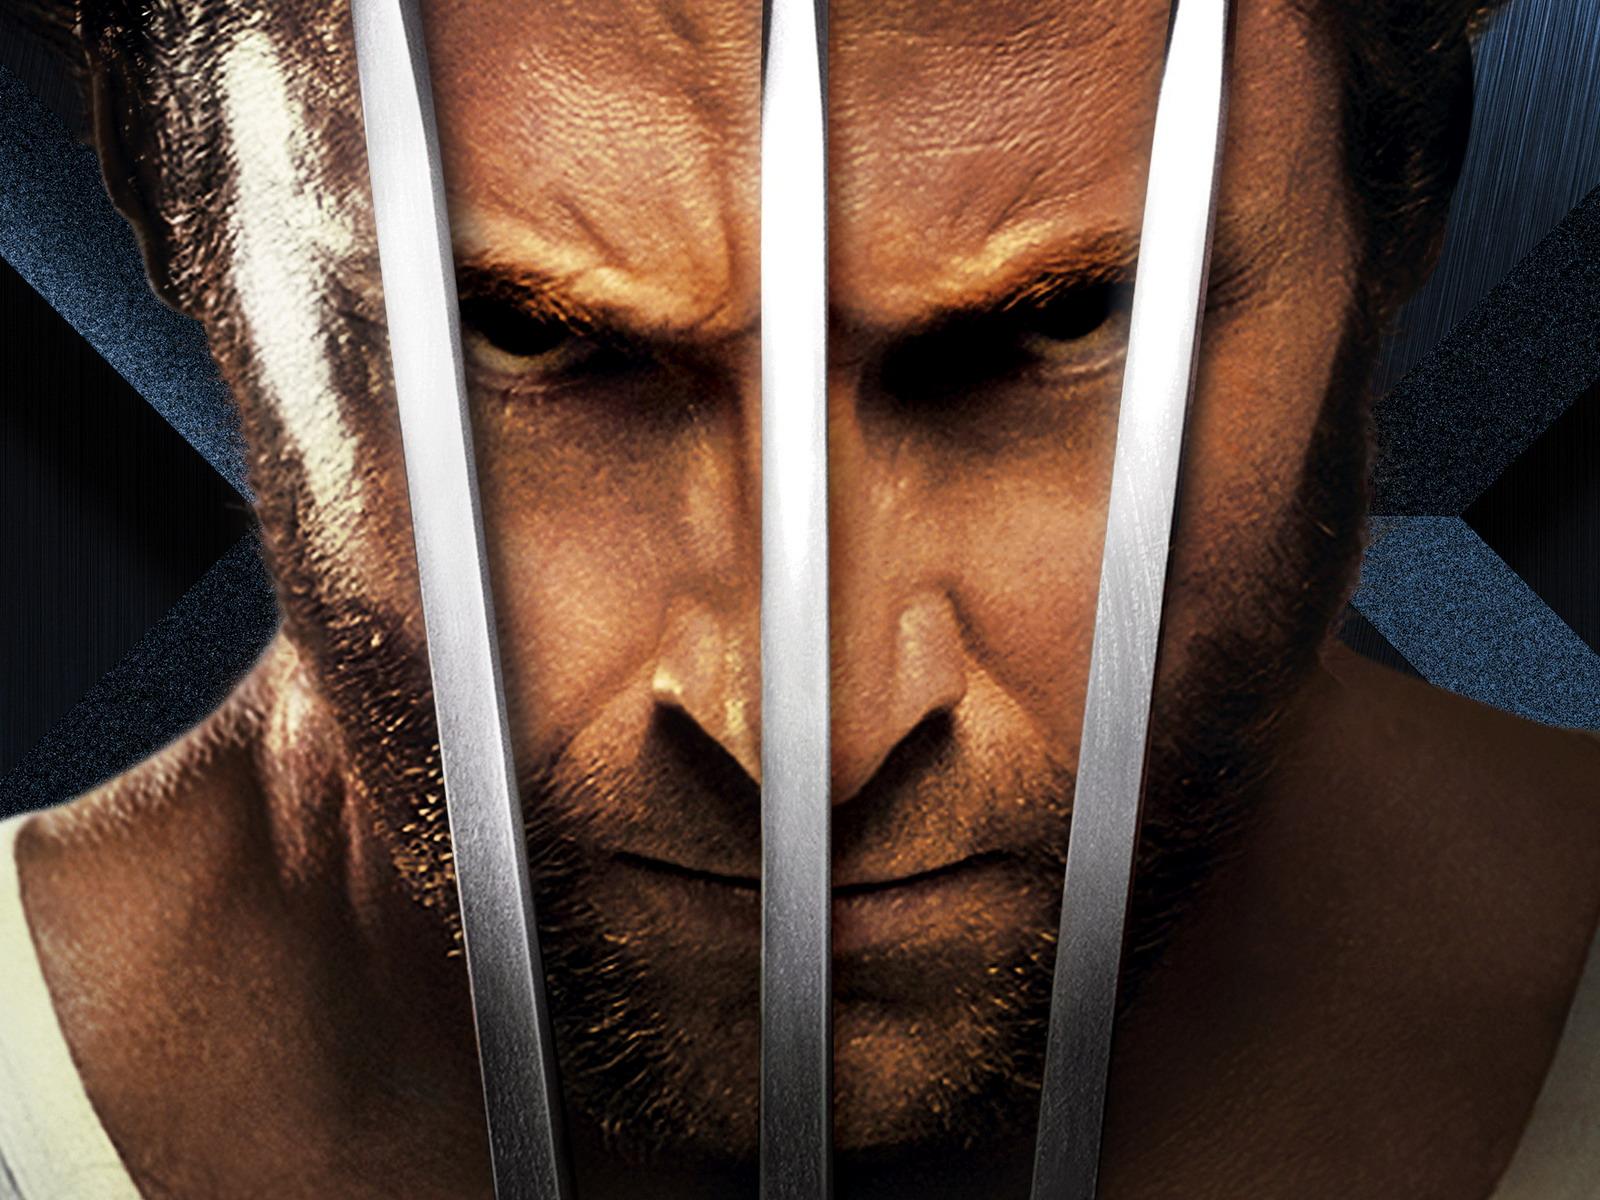 Image X Men X Men Origins Wolverine Movies